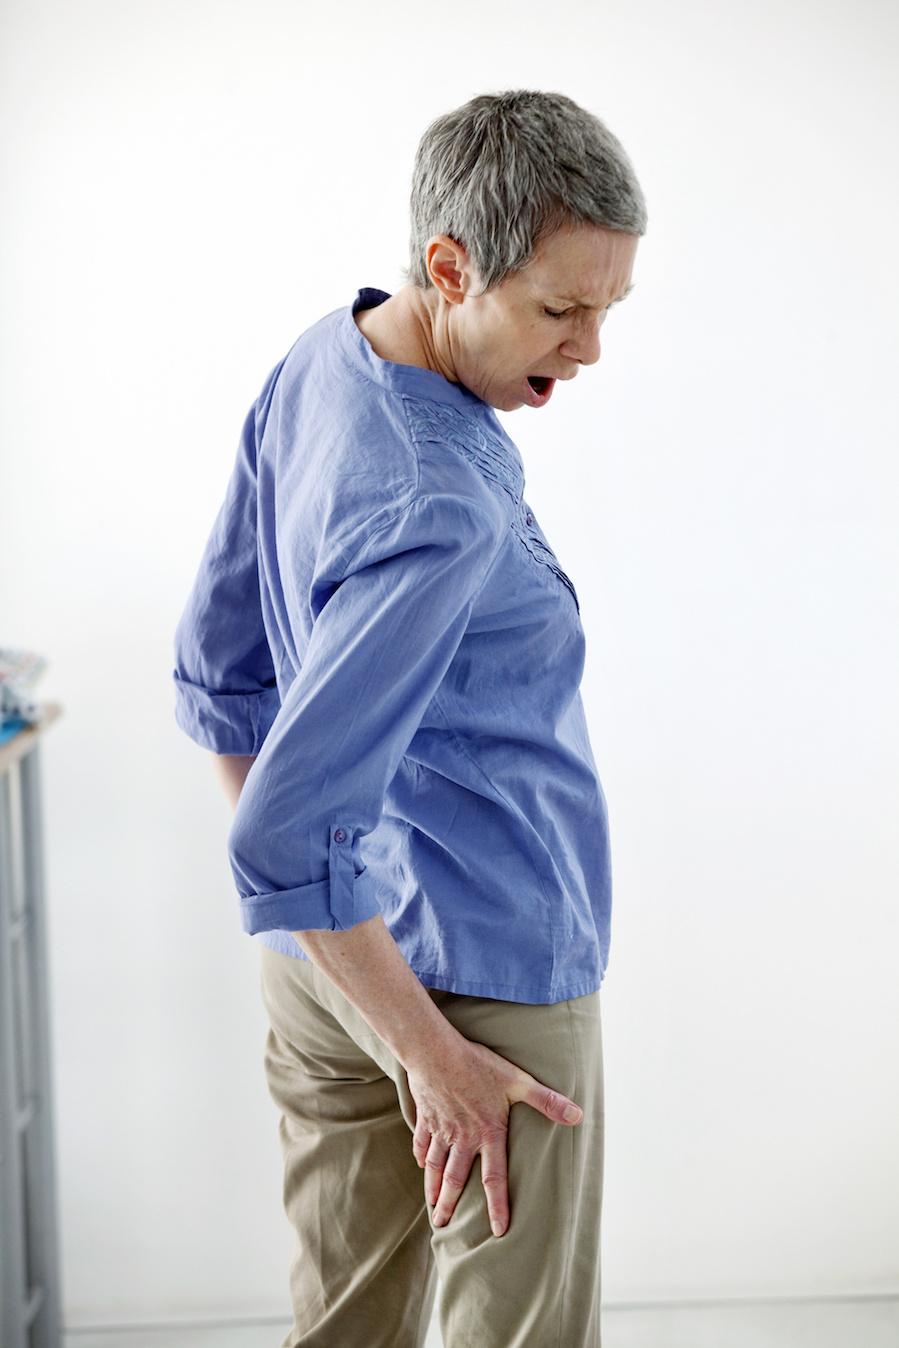 What is sciatica? - Estuary Clinic, Topsham Exeter